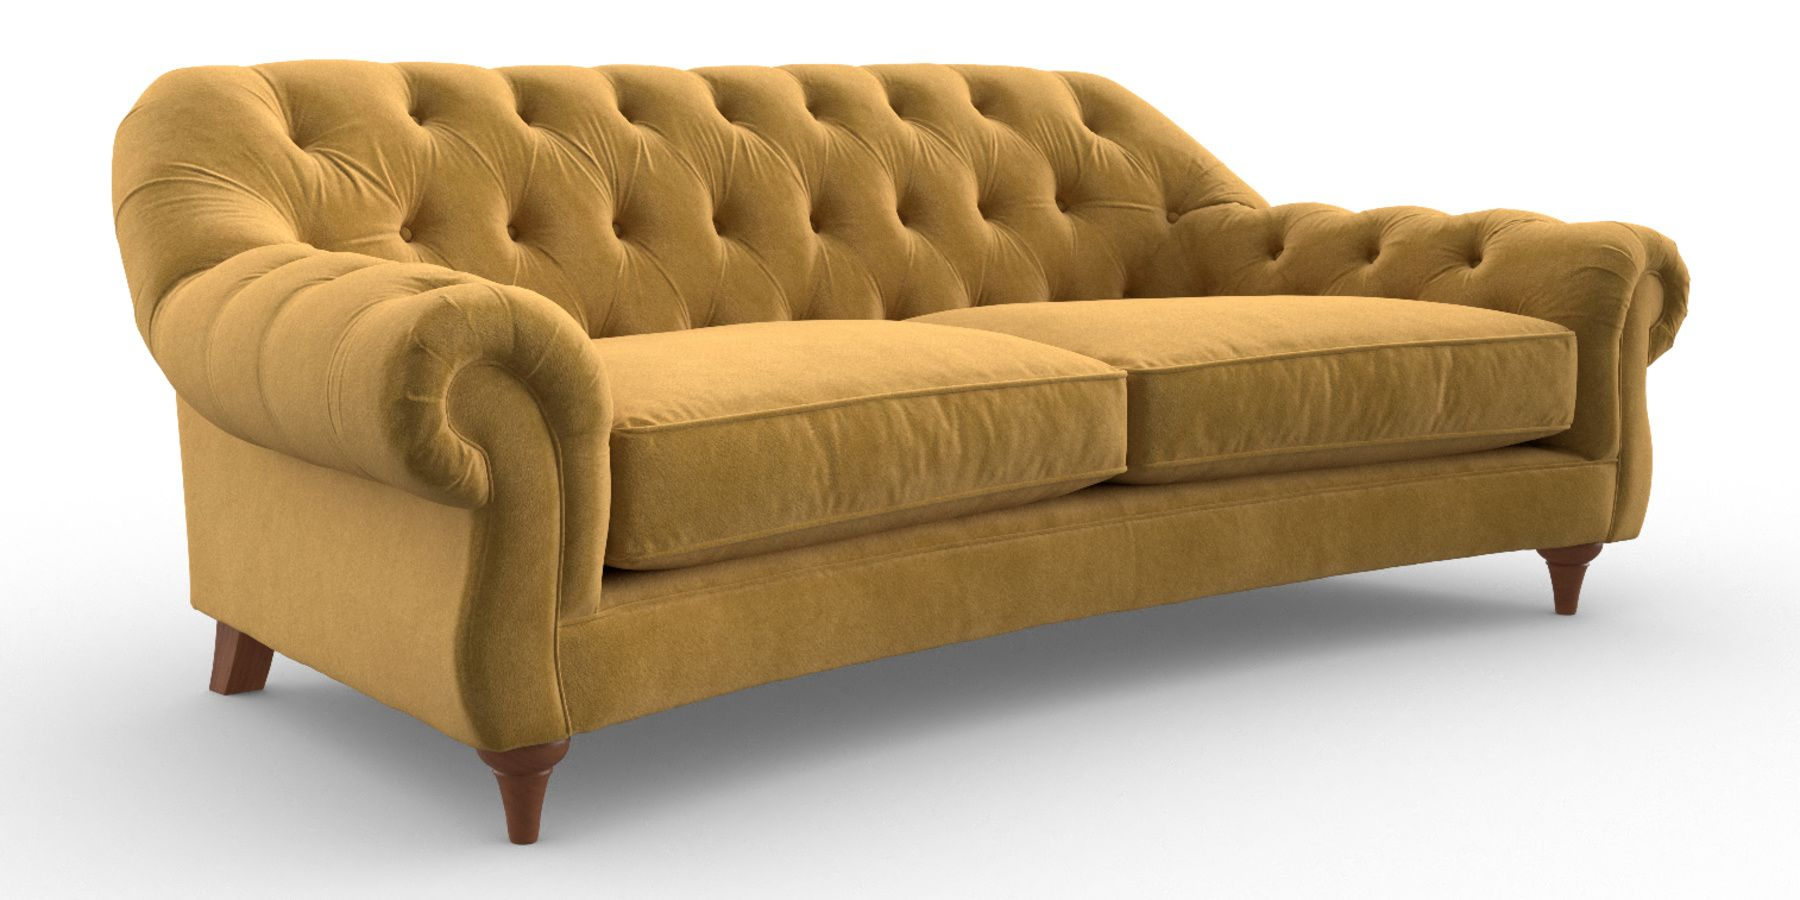 Buy portofino large sofa 3 seats matt velvet mustard